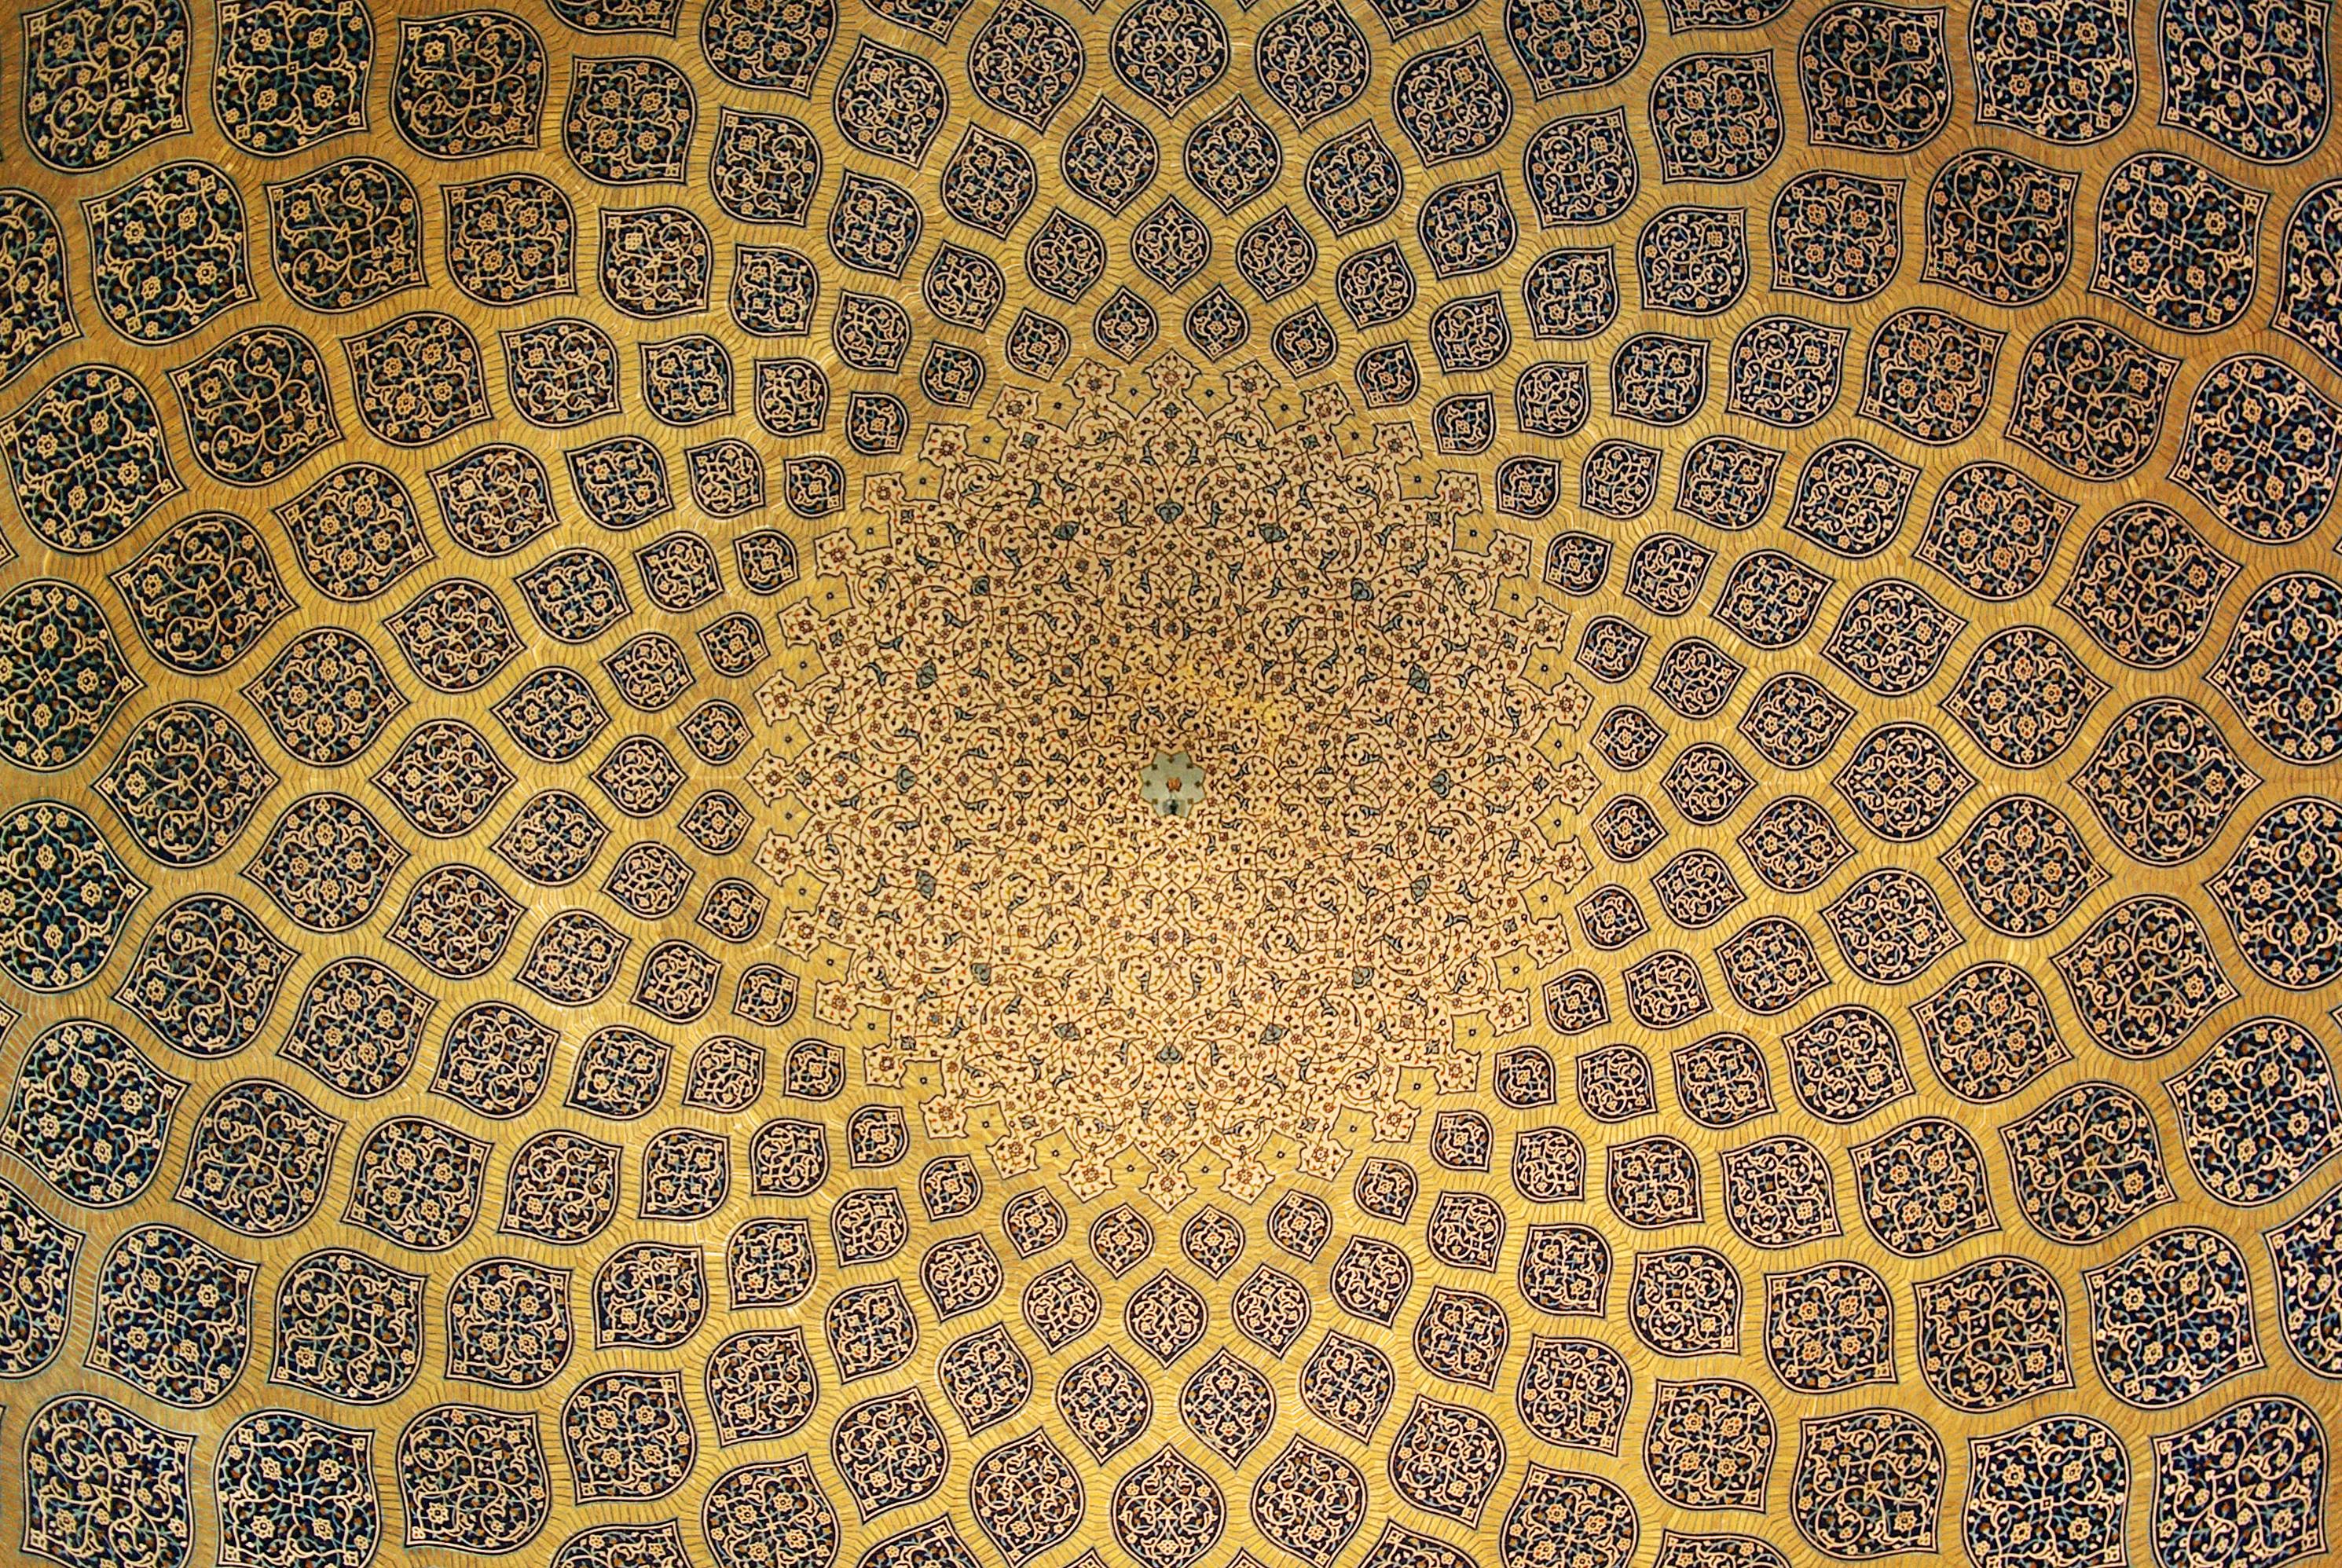 #travelblog #maverickbird #Iran